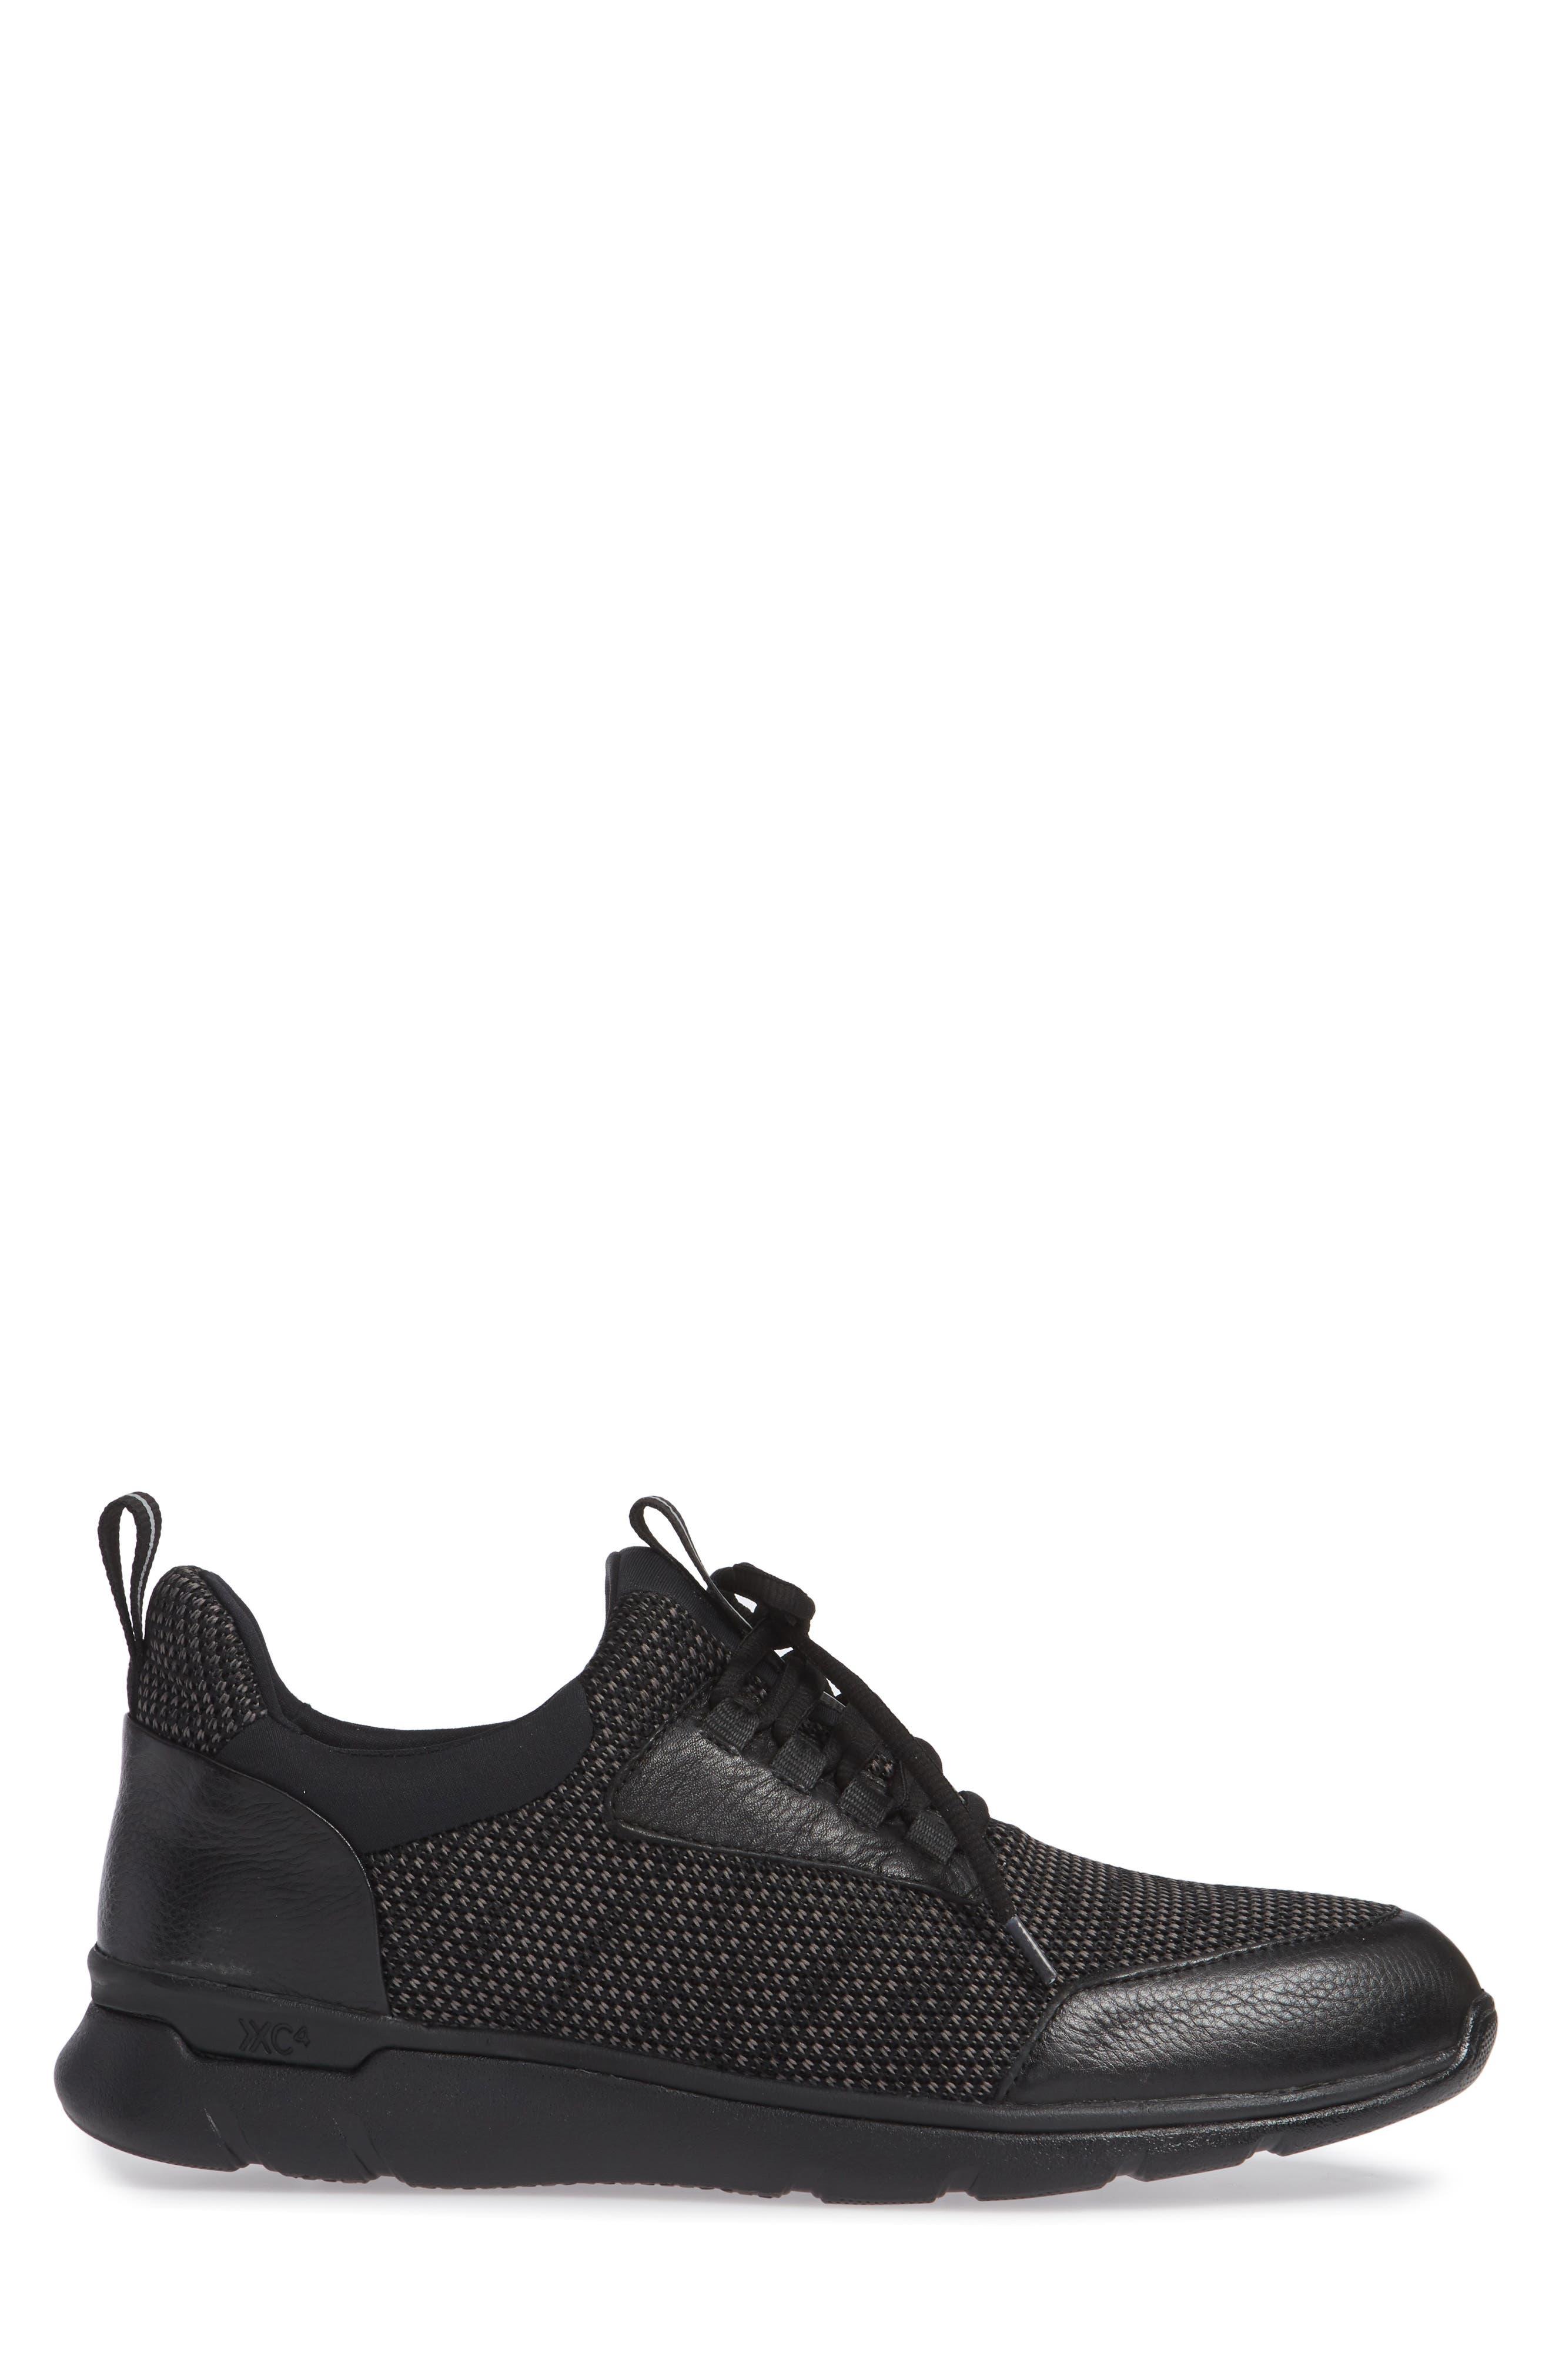 Prentiss XC4<sup>®</sup> Waterproof Sneaker,                             Alternate thumbnail 3, color,                             BLACK LEATHER